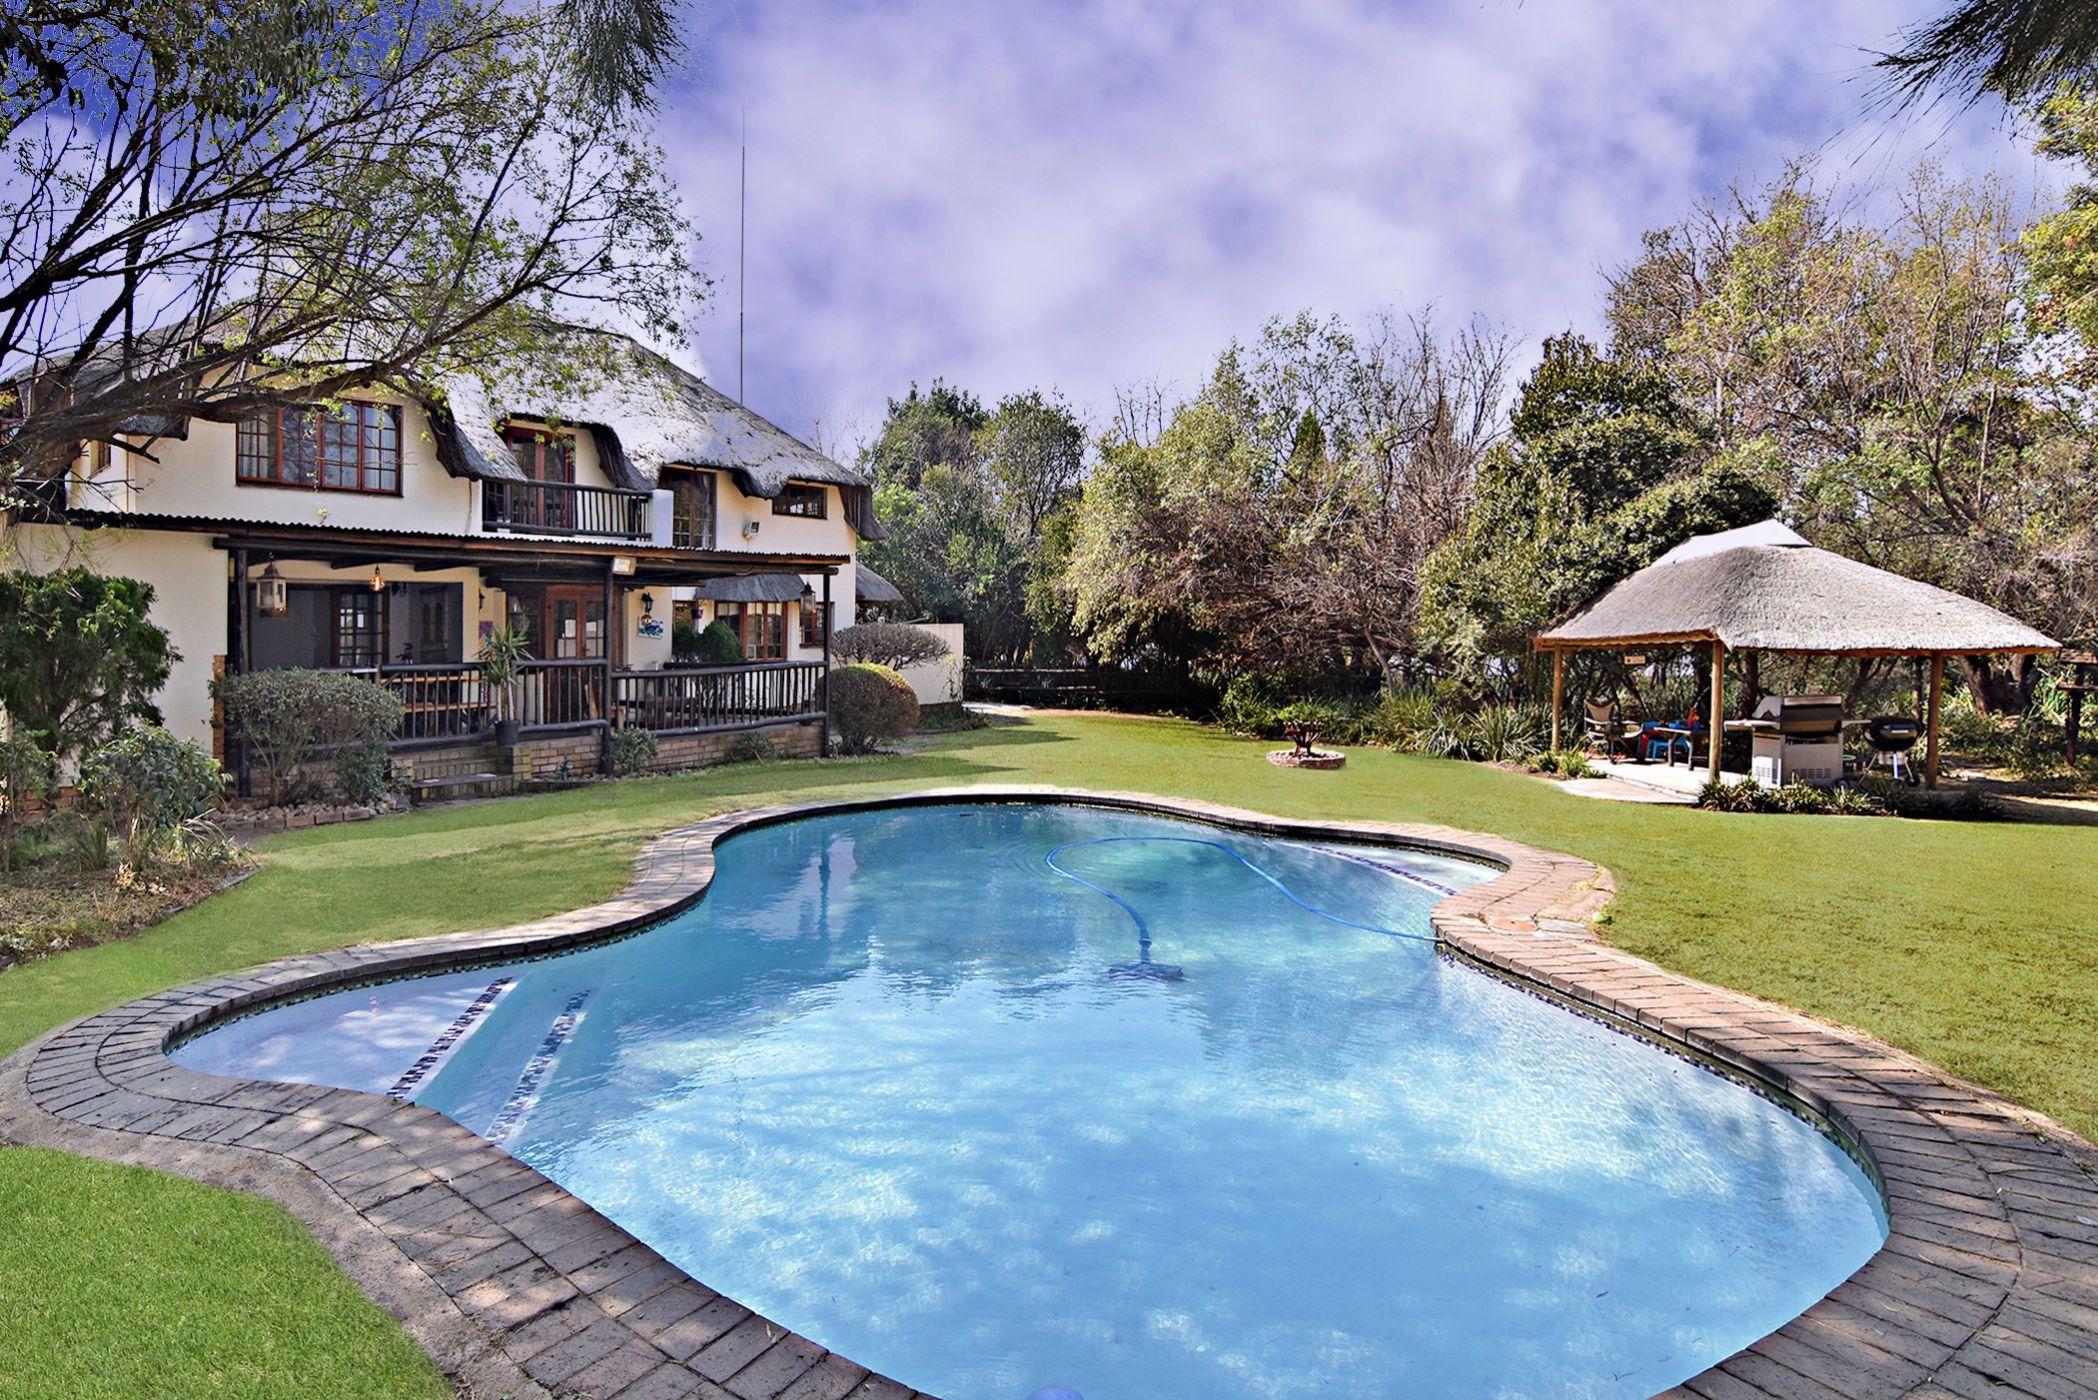 4 bedroom house for sale in Randjesfontein